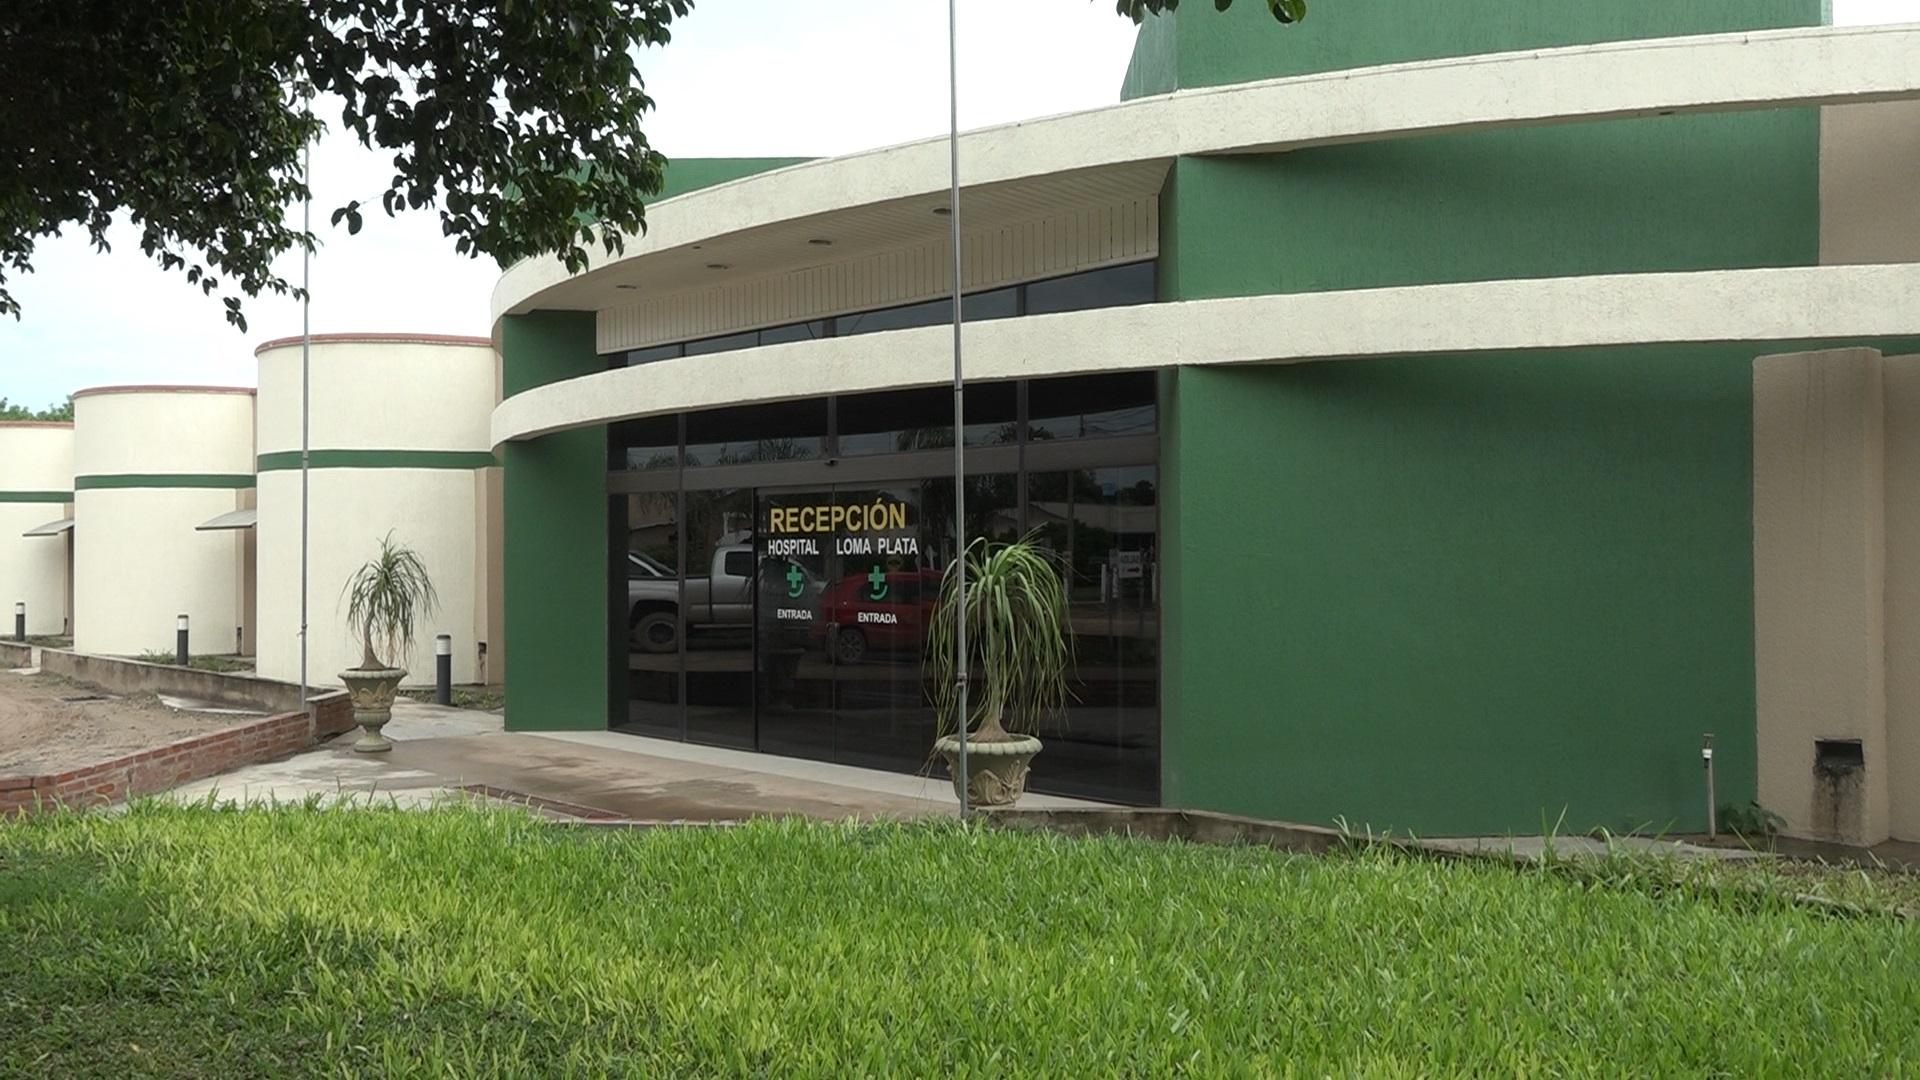 Hospital Loma Plata chaco- samap